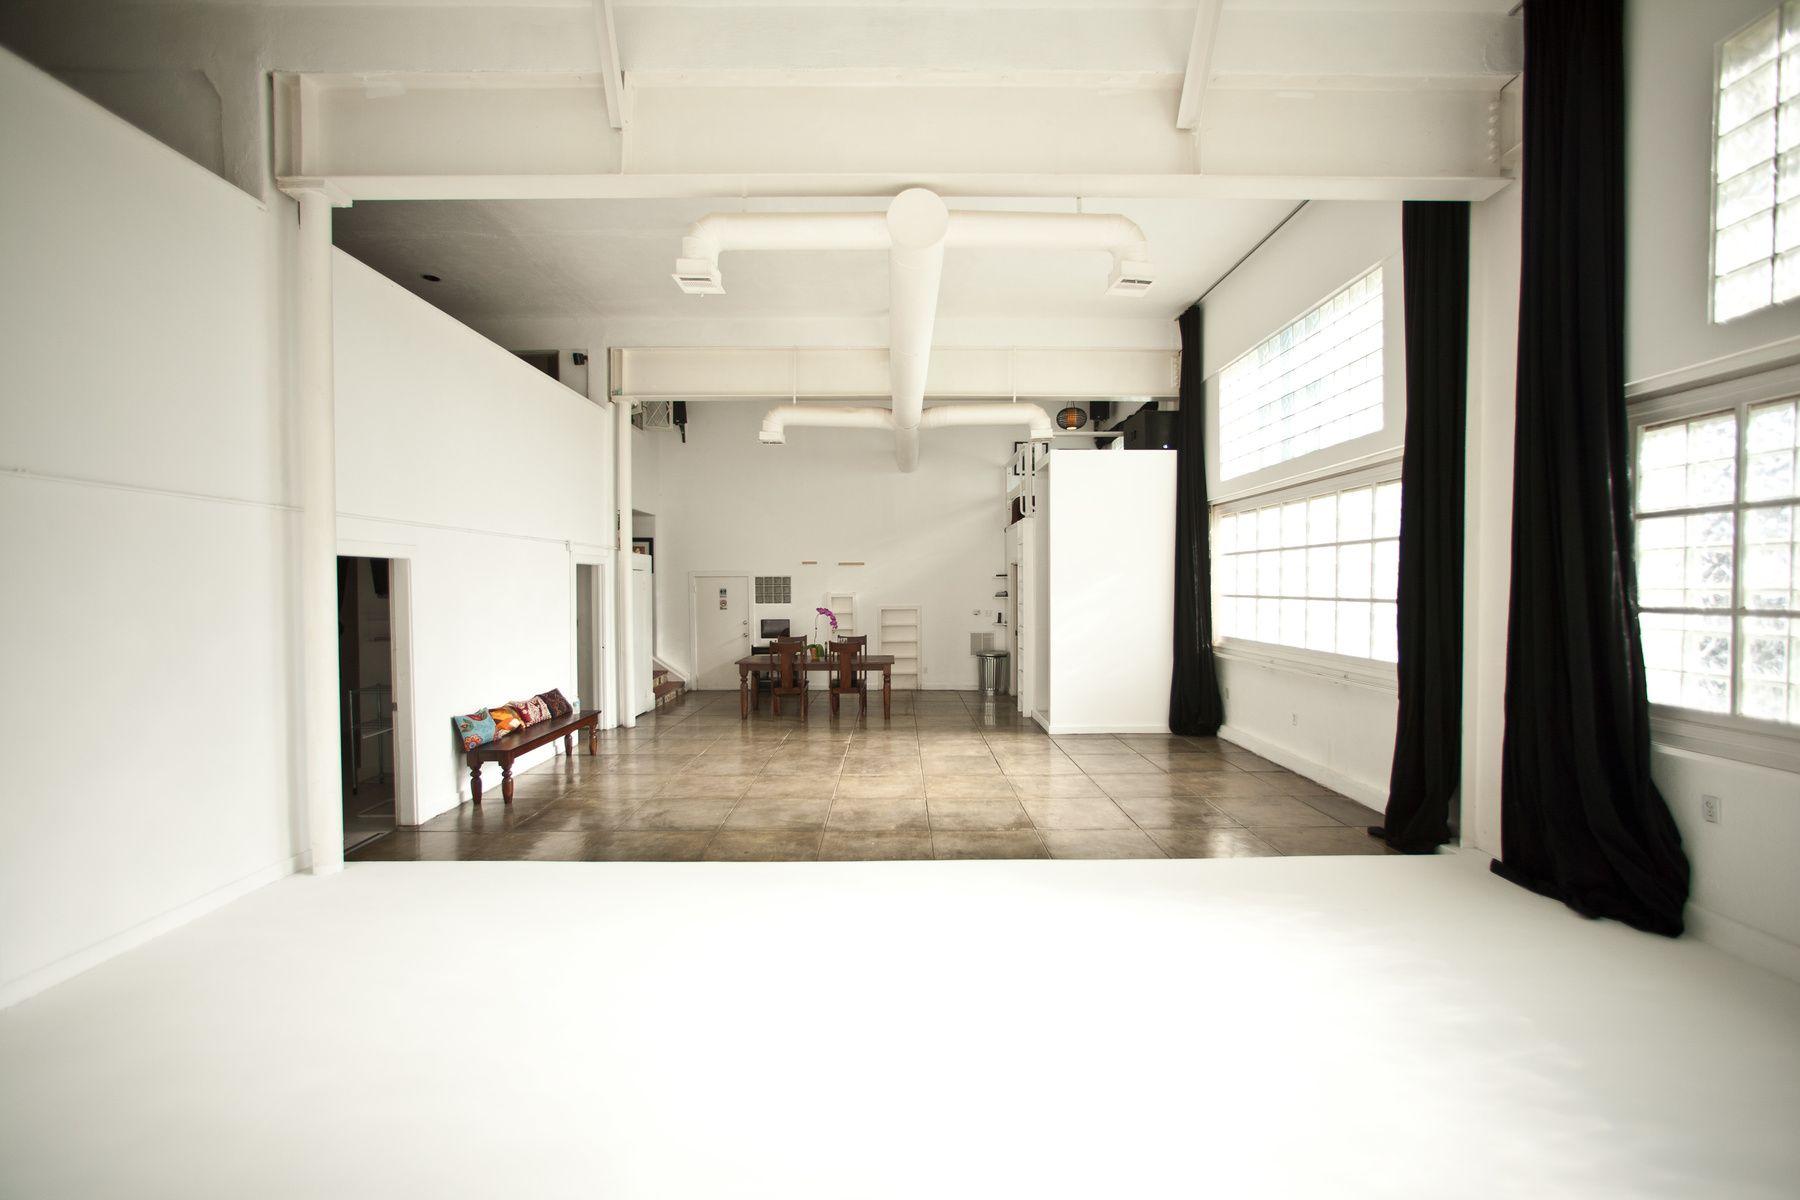 los angeles photo studio rental google search location pinterest